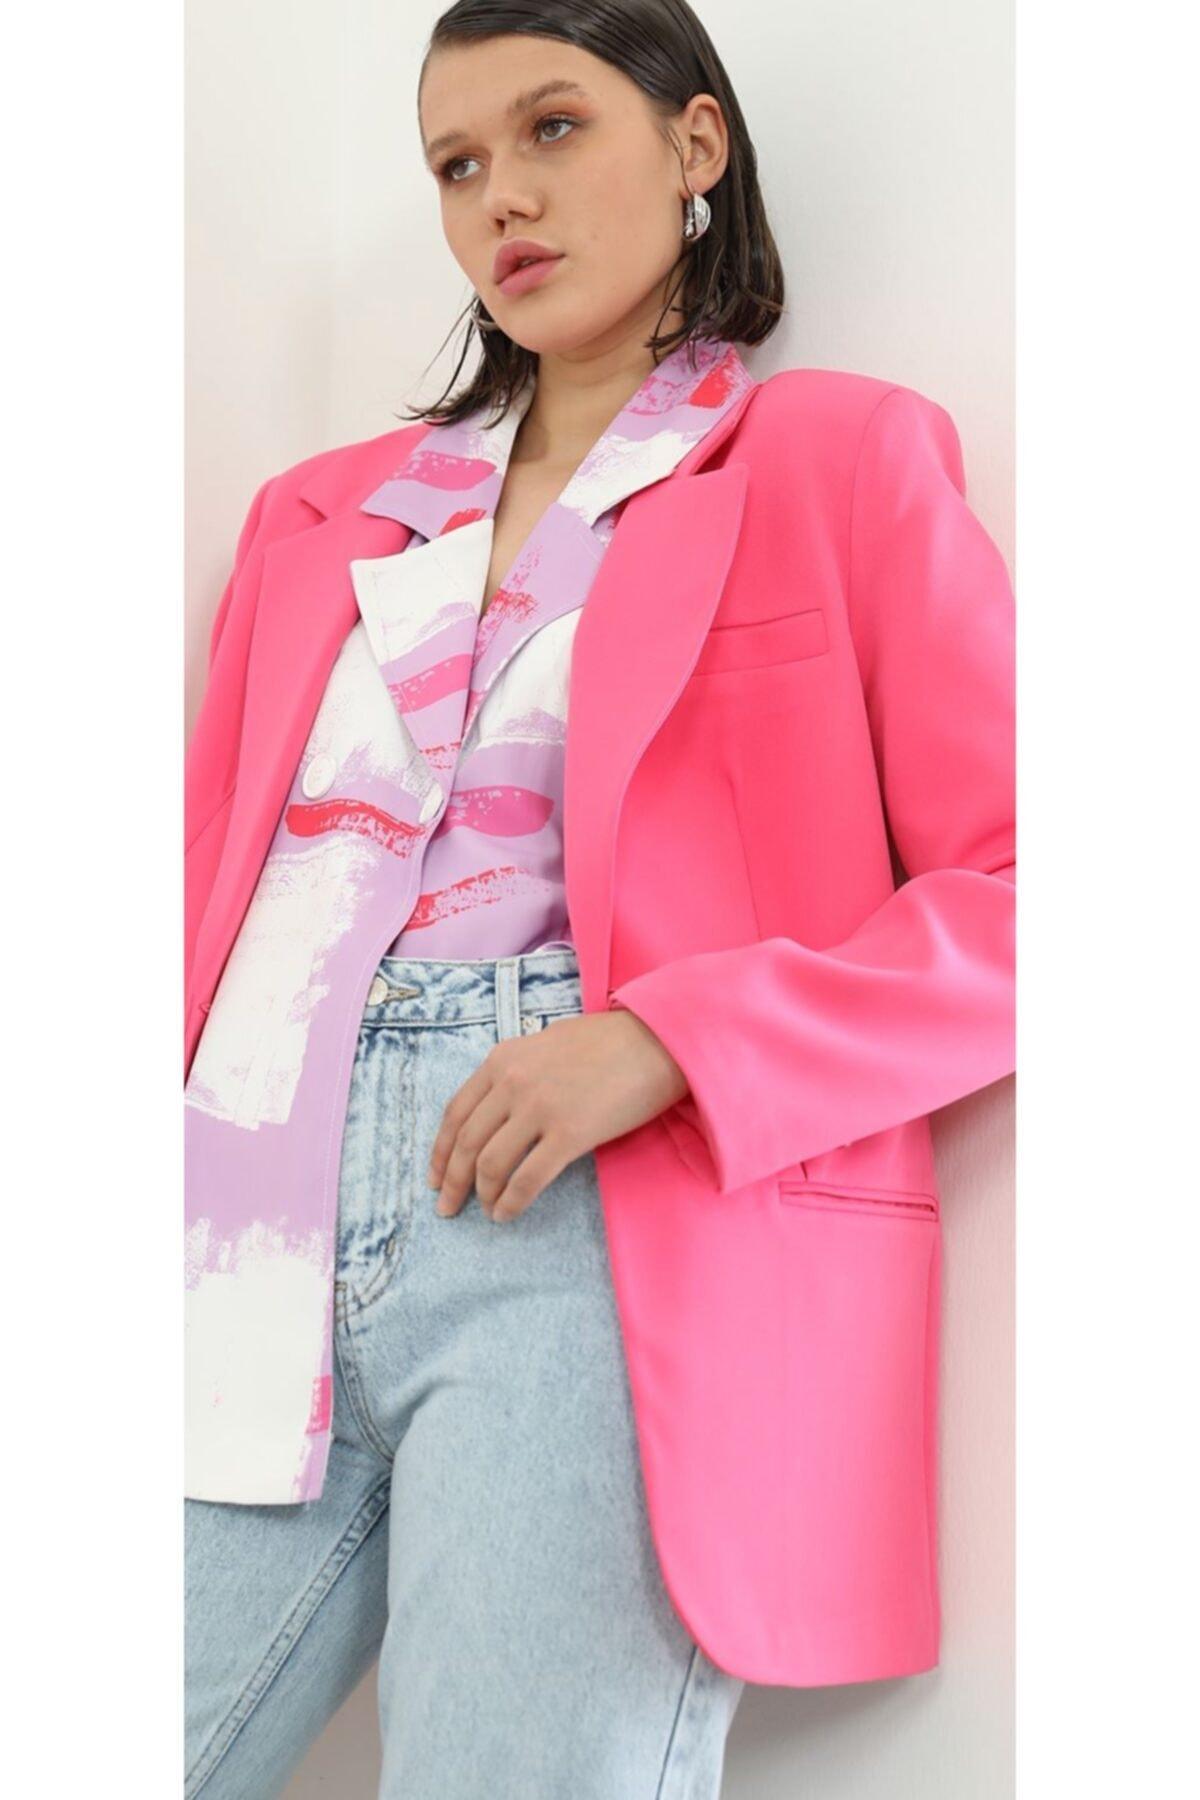 The Ness Collection Fuşya Boyfriend Blazer Ceket 1